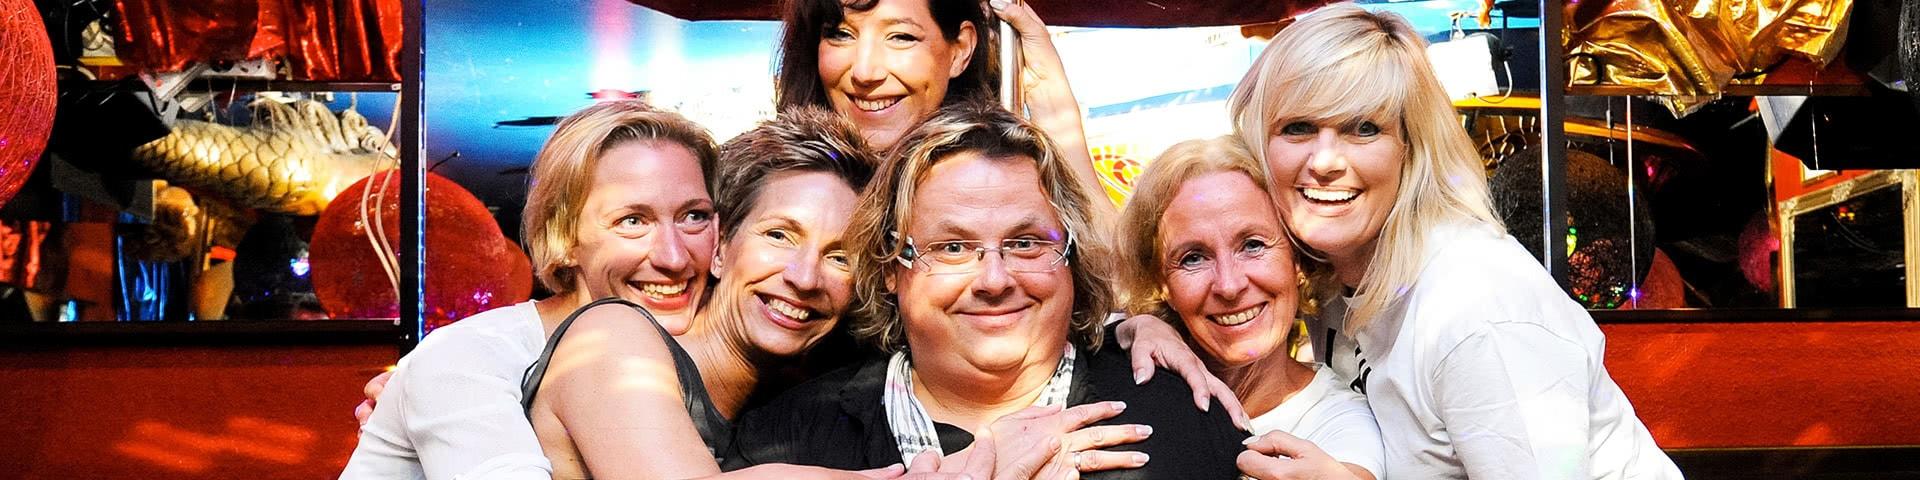 Frauengruppe mit Tante Jens auf Norderney